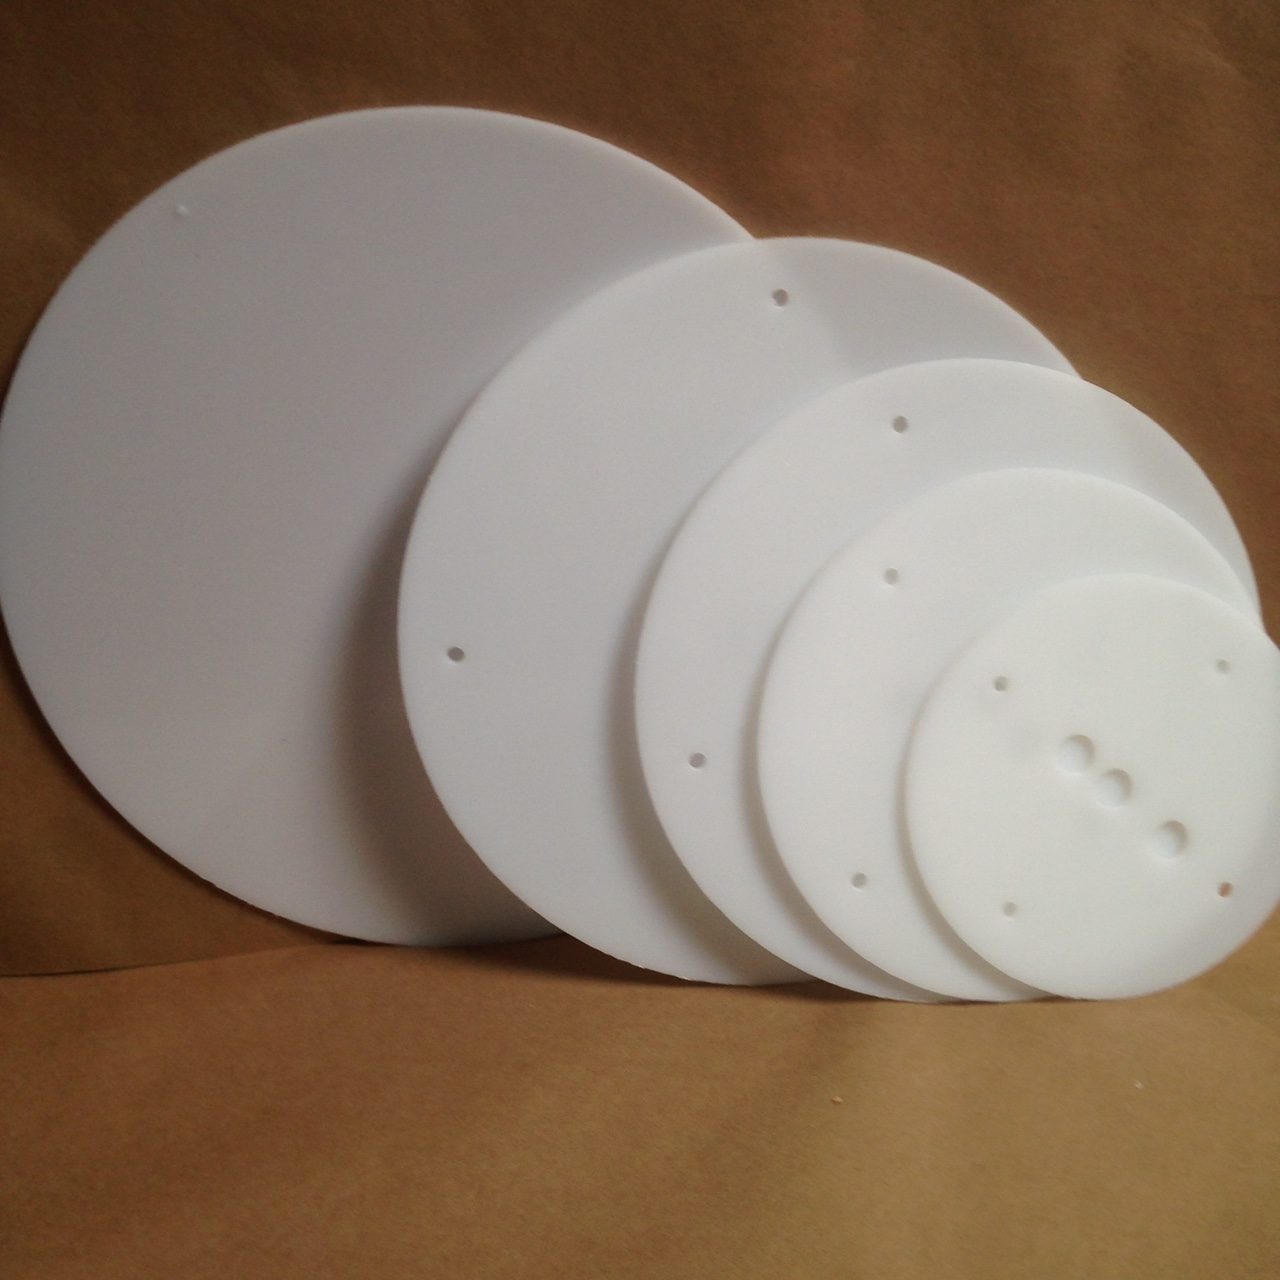 16-14-12-10-8 inch round plastic cake board set